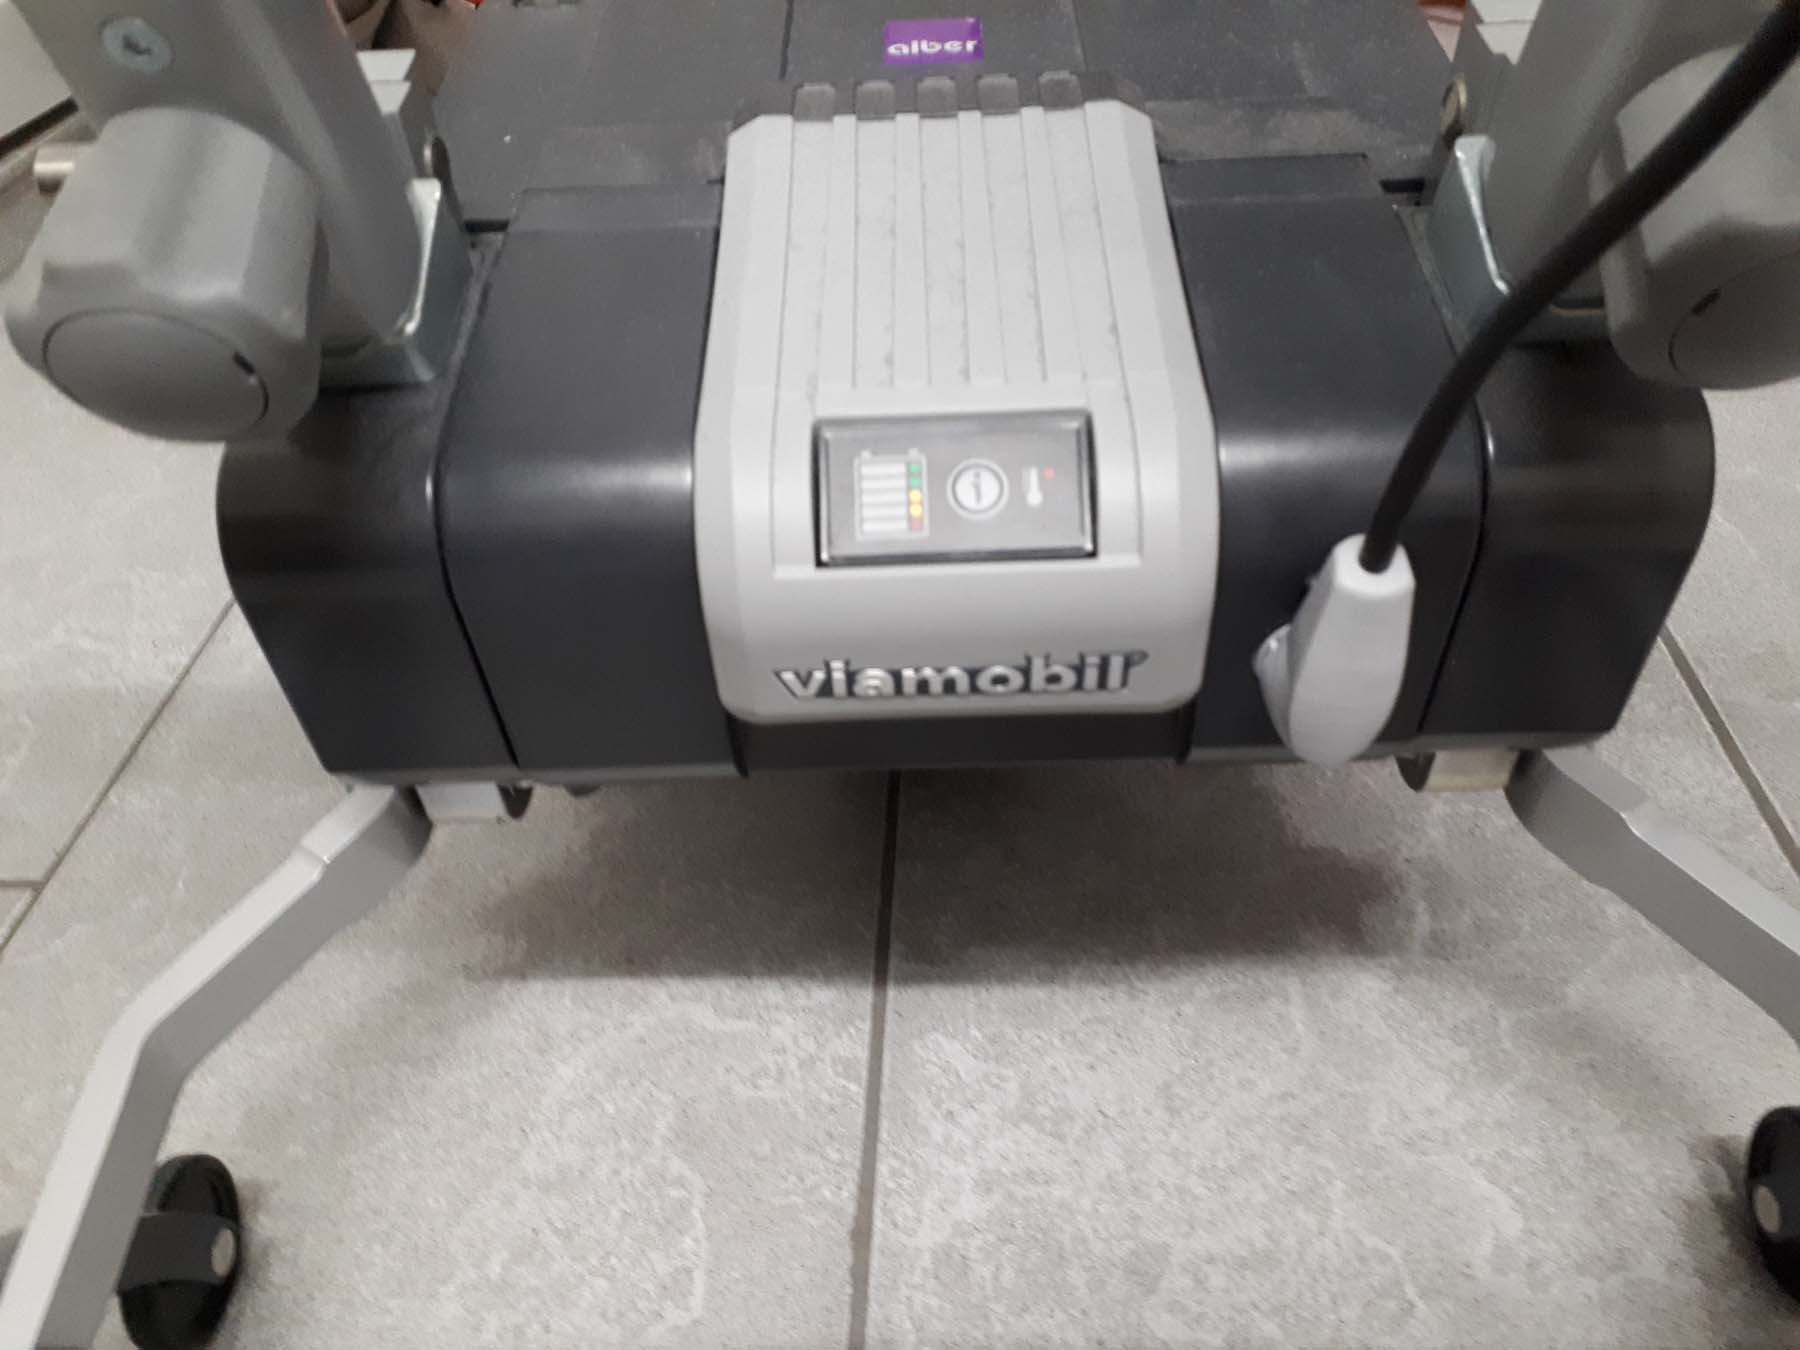 occasion-kueschall-compact-viamobil-minder-04